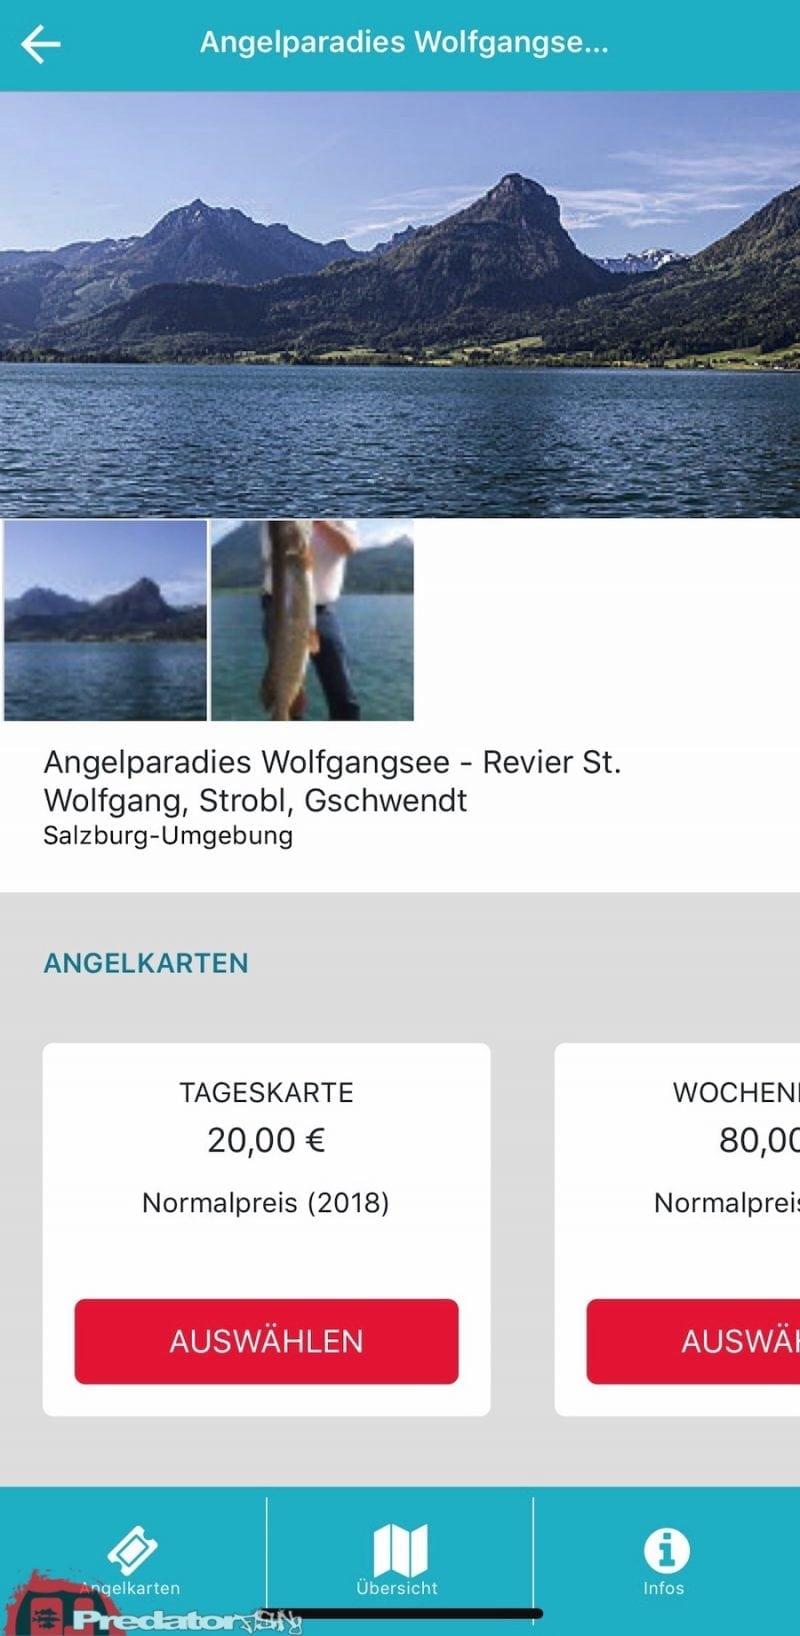 Raubfisch-Angeln am Wolfgangsee Lizenzen